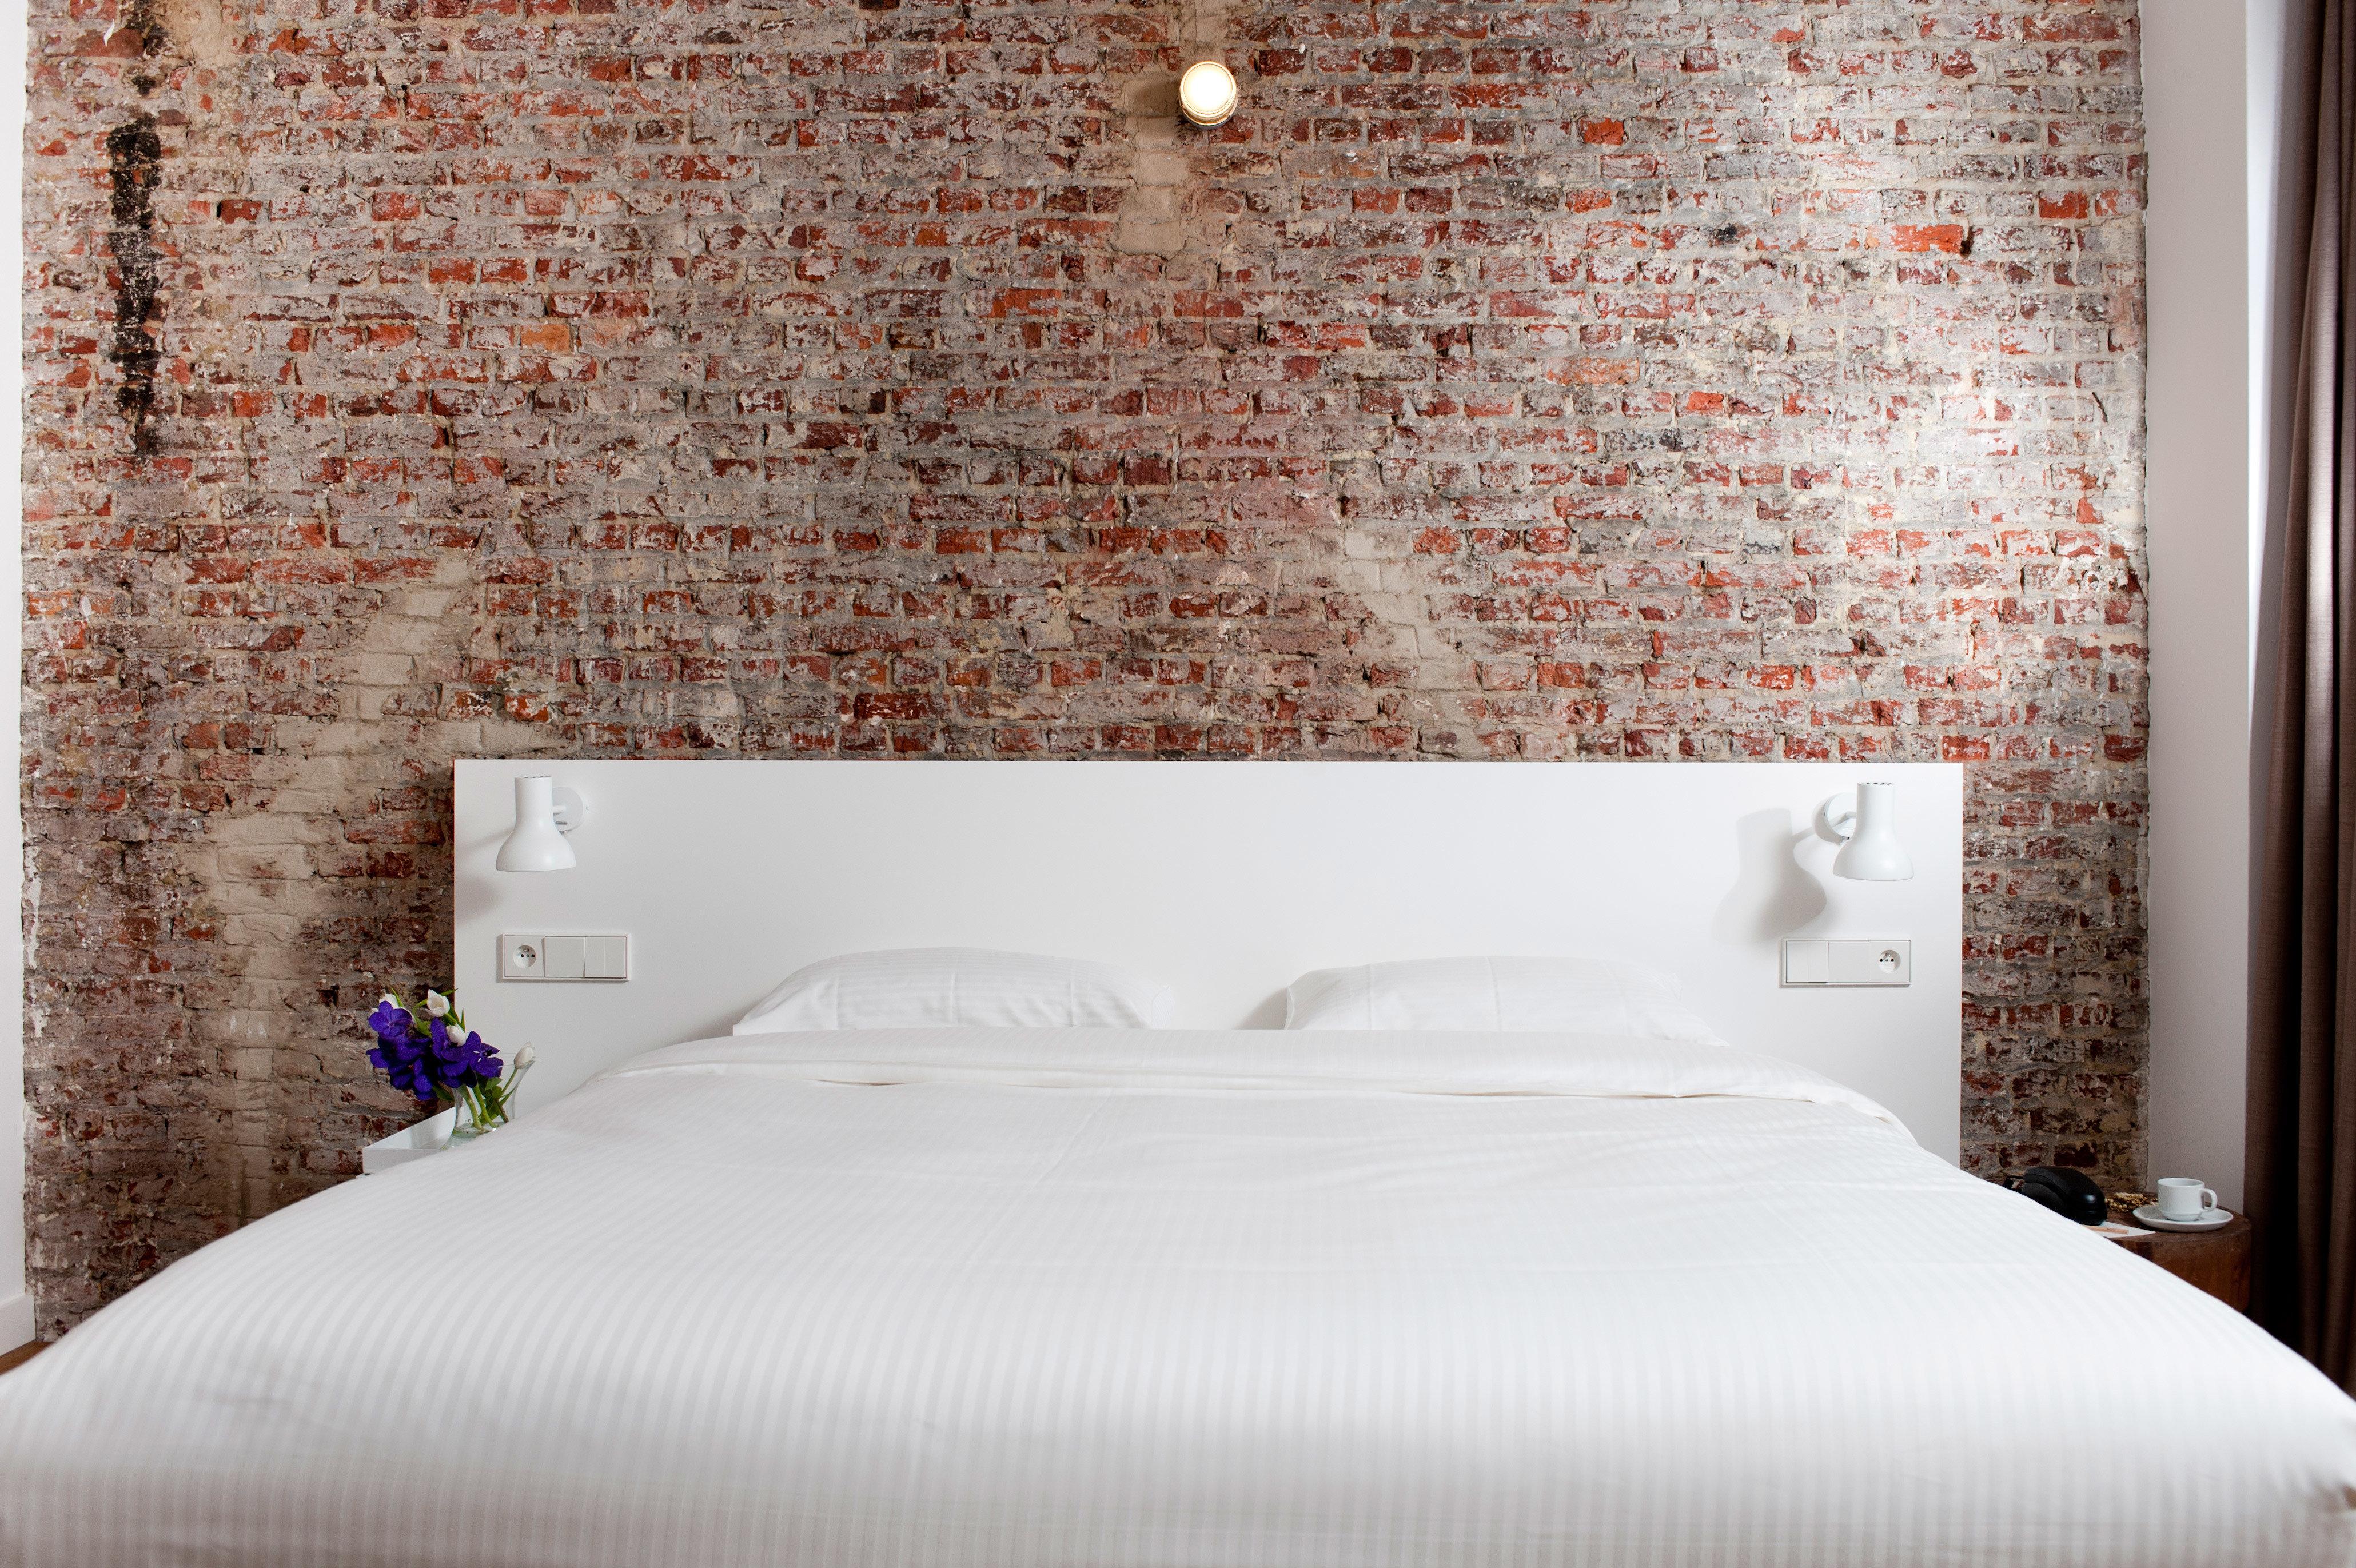 Bedroom City Hip Modern white bed sheet textile wallpaper cottage